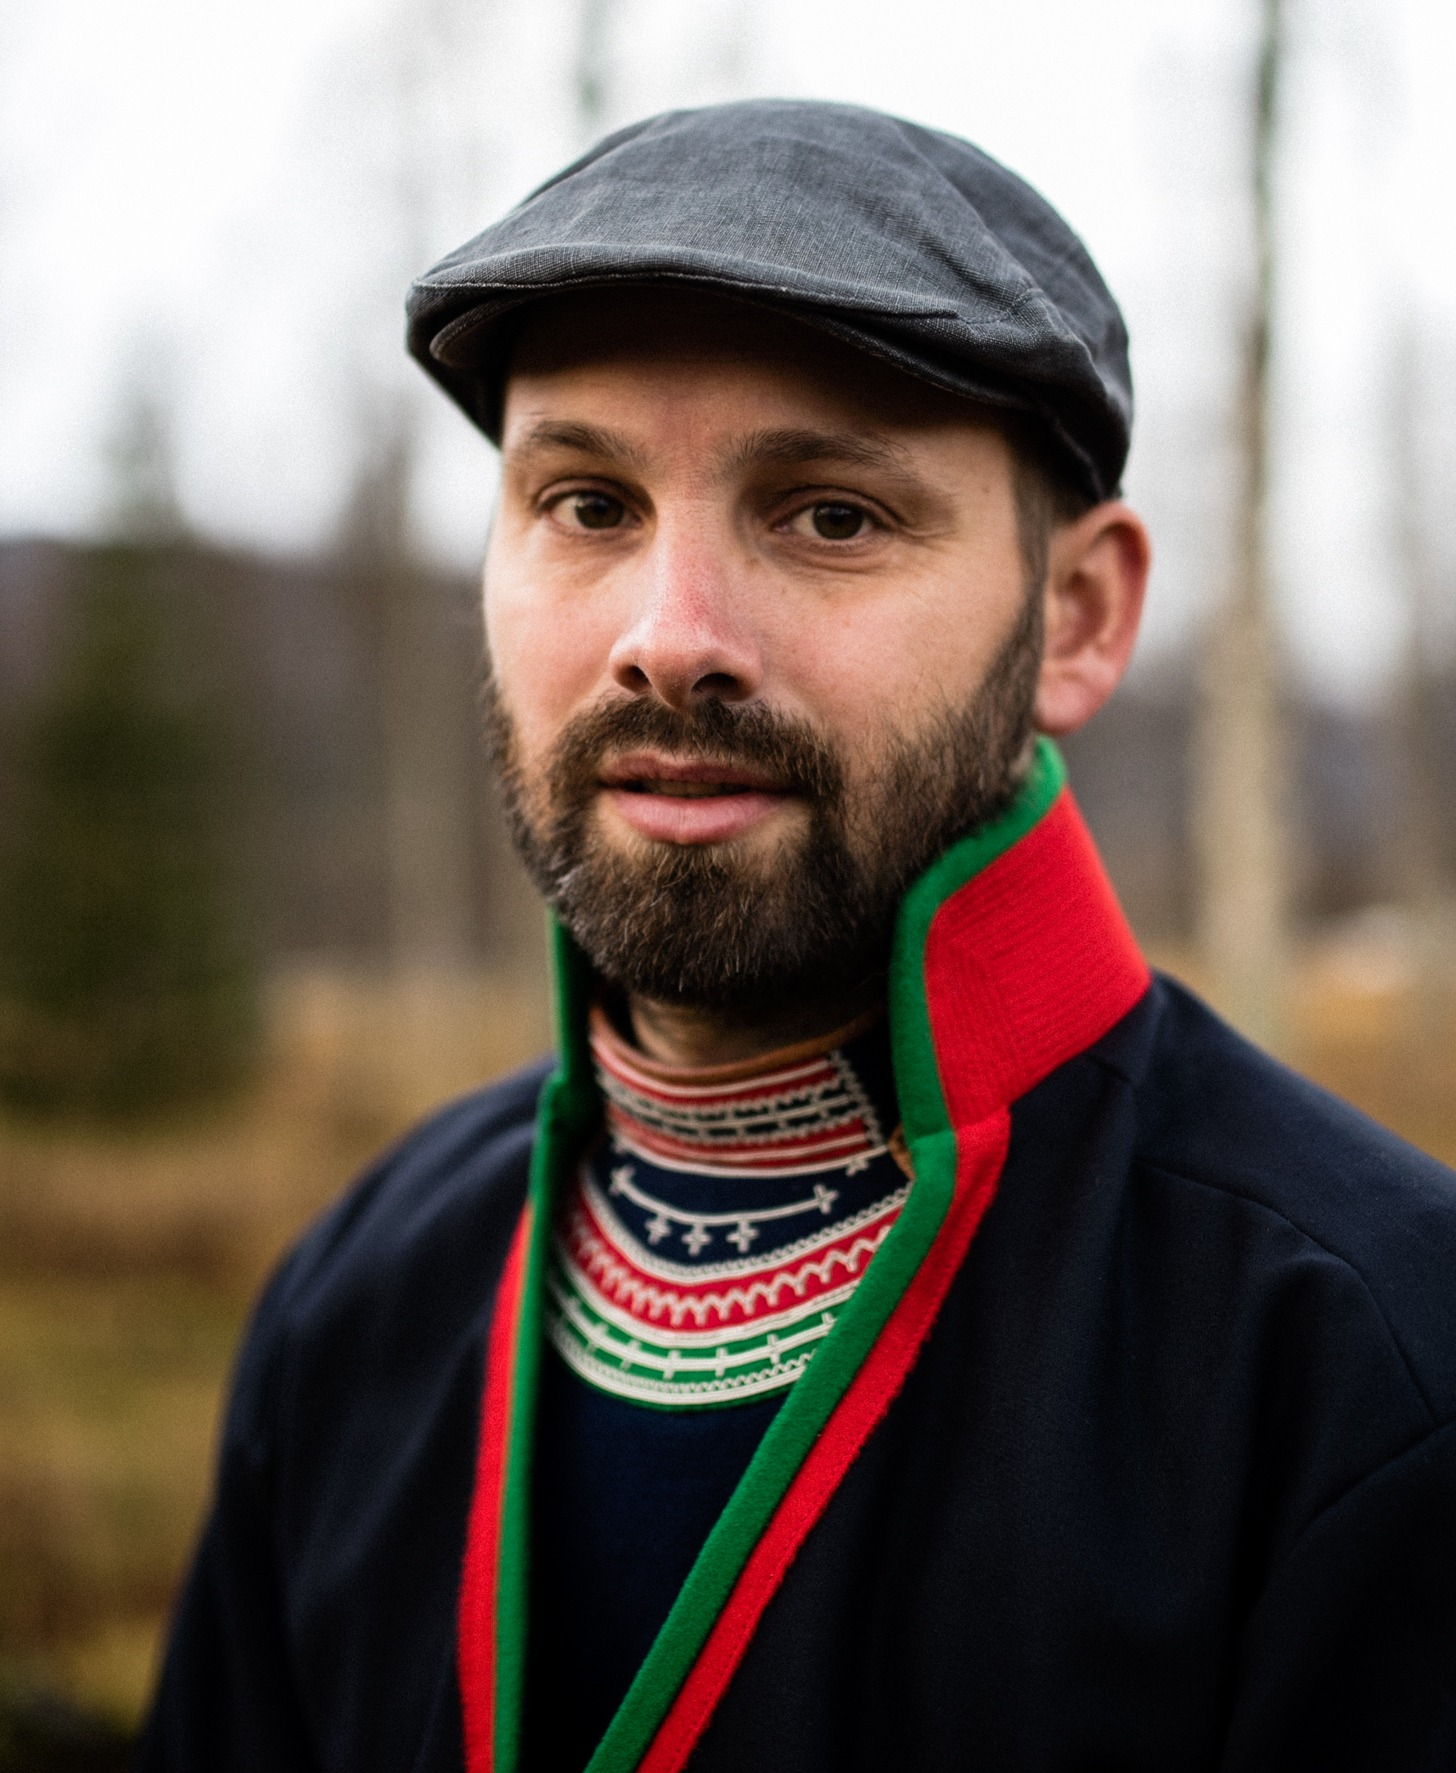 Oskar Njajta Östergren